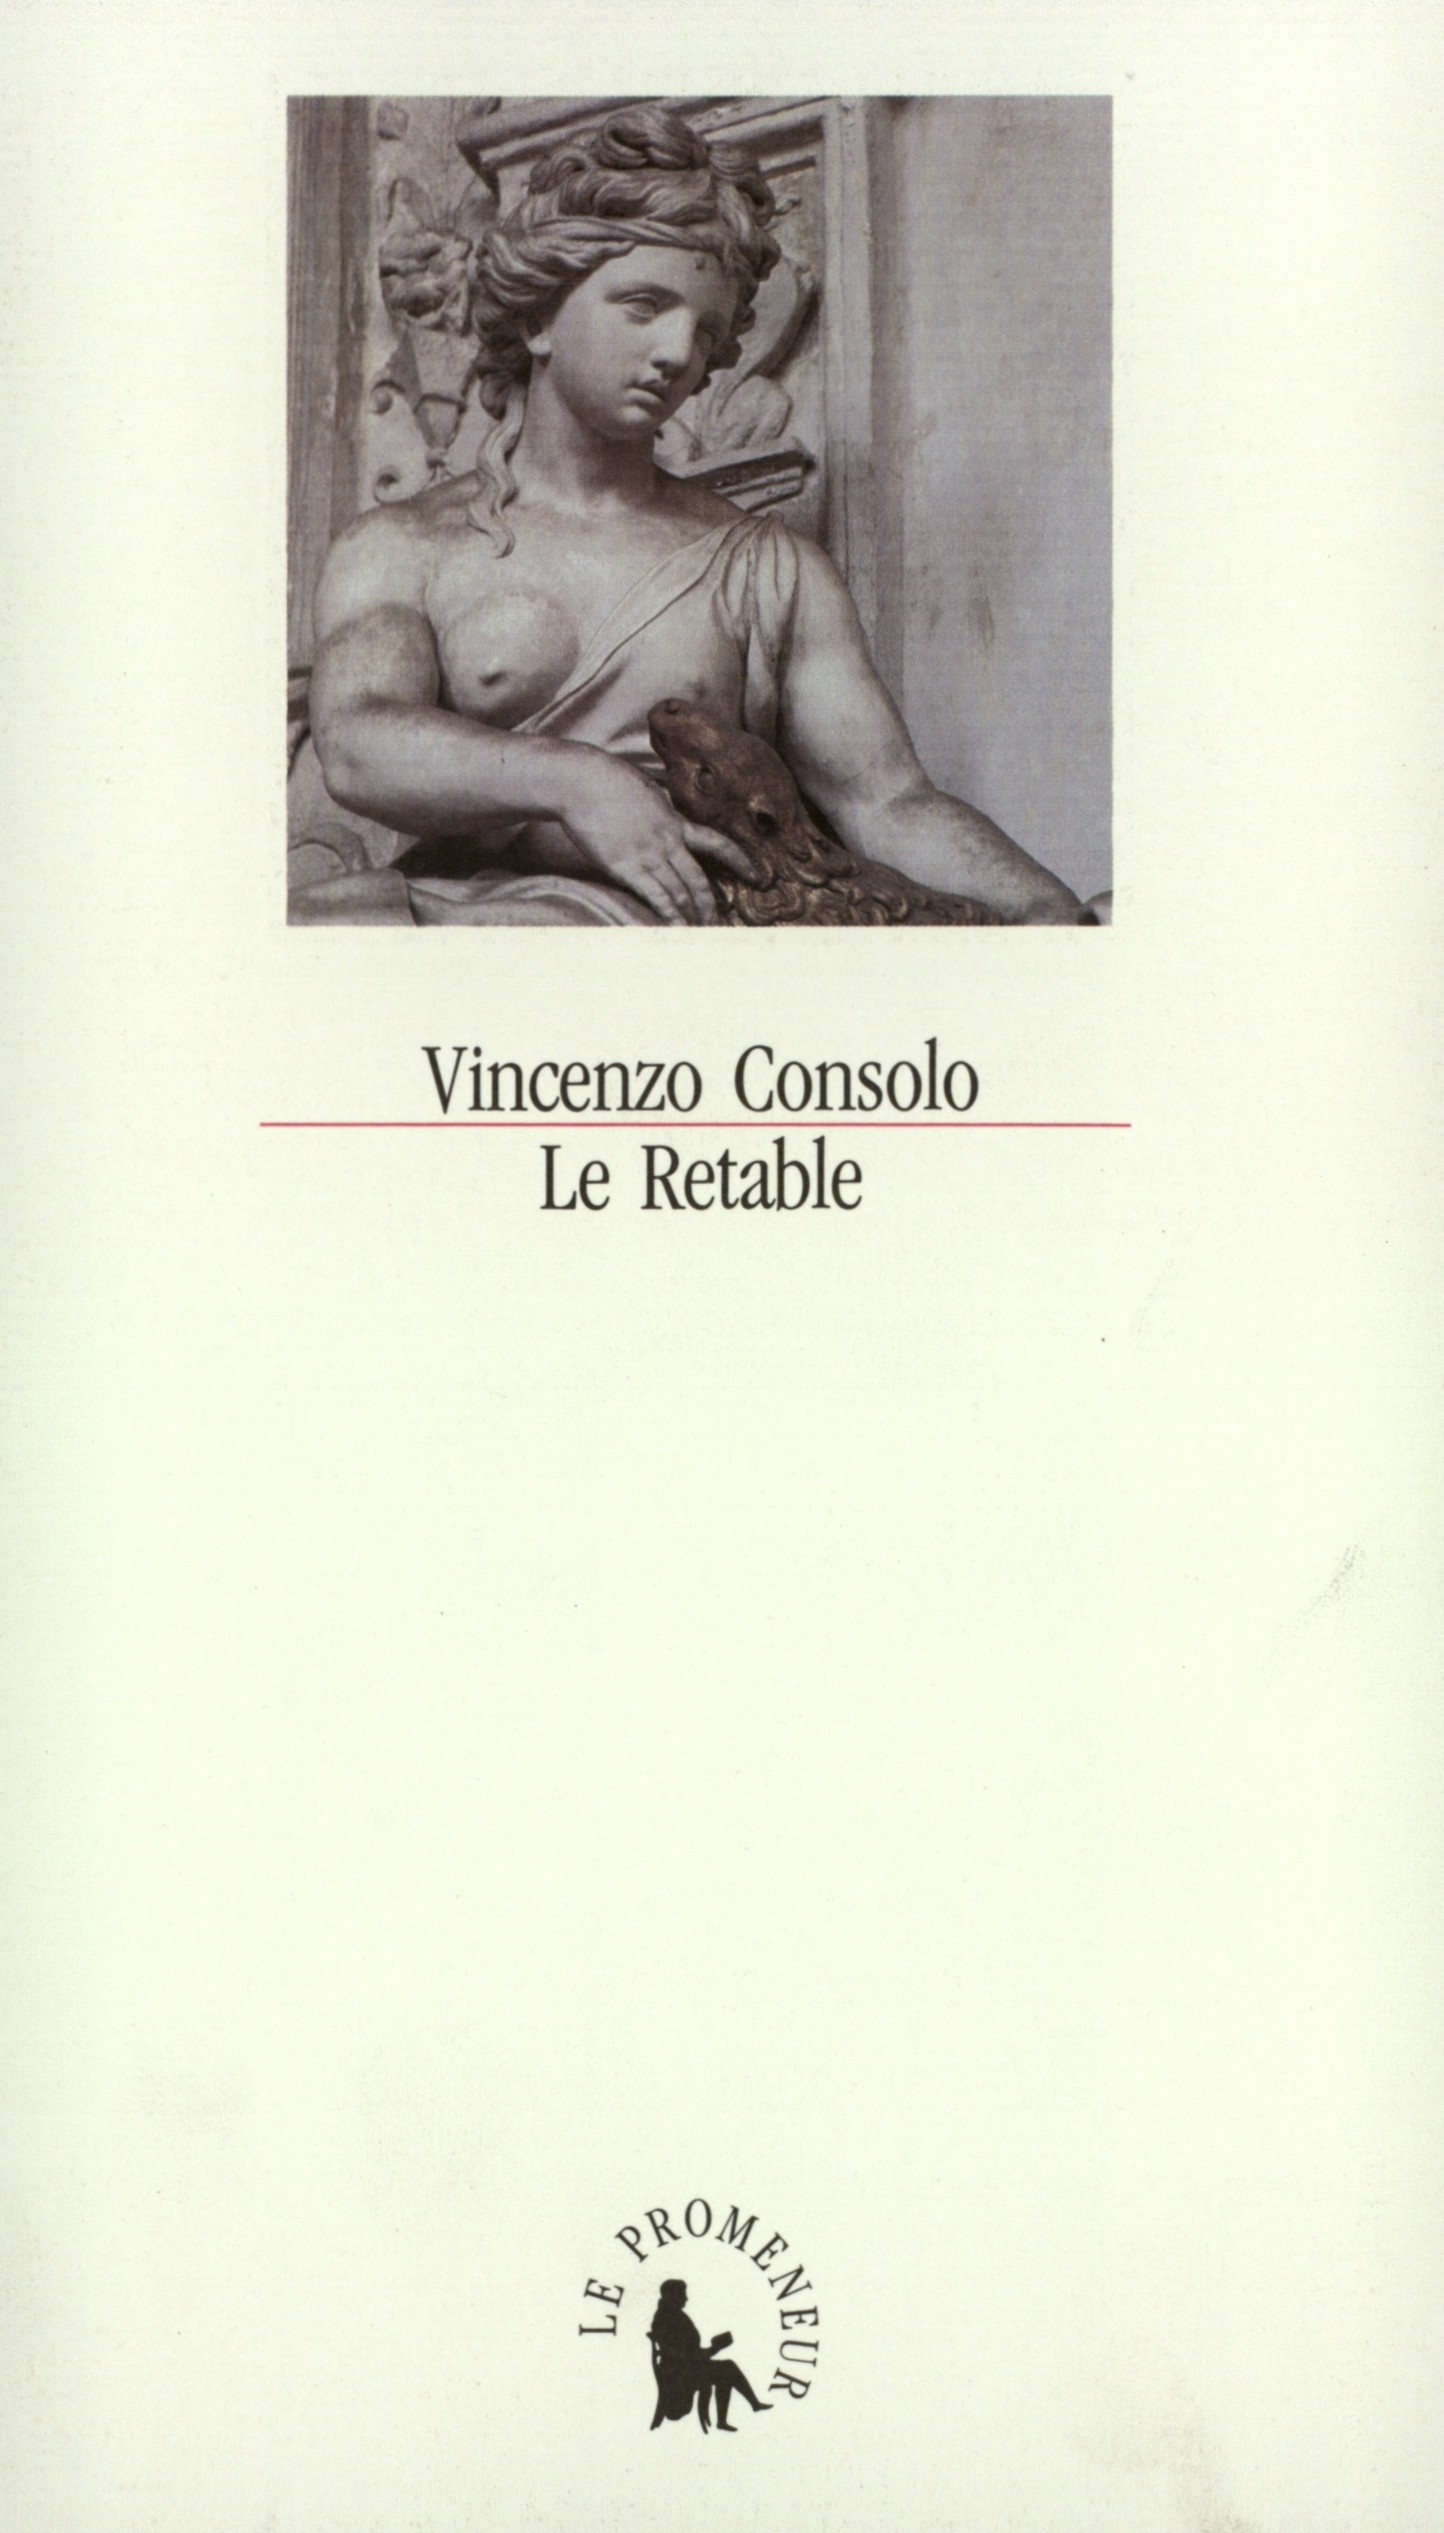 livre : vincenzo consolo, le retable